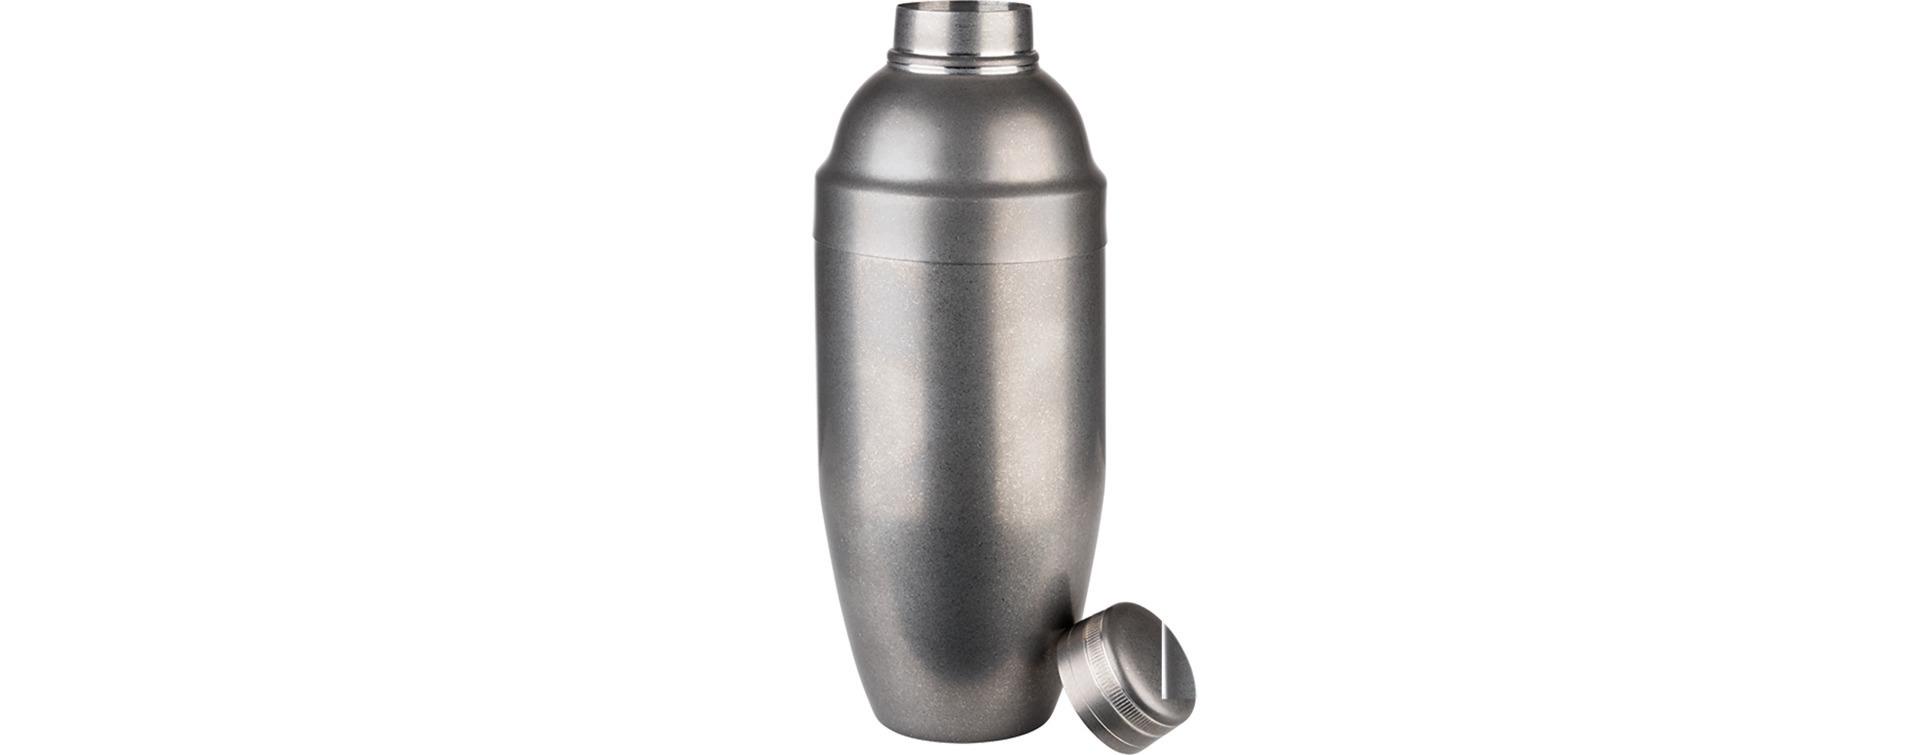 Shaker 0,70 l Edelstahl Antik-Edelstahl-Look